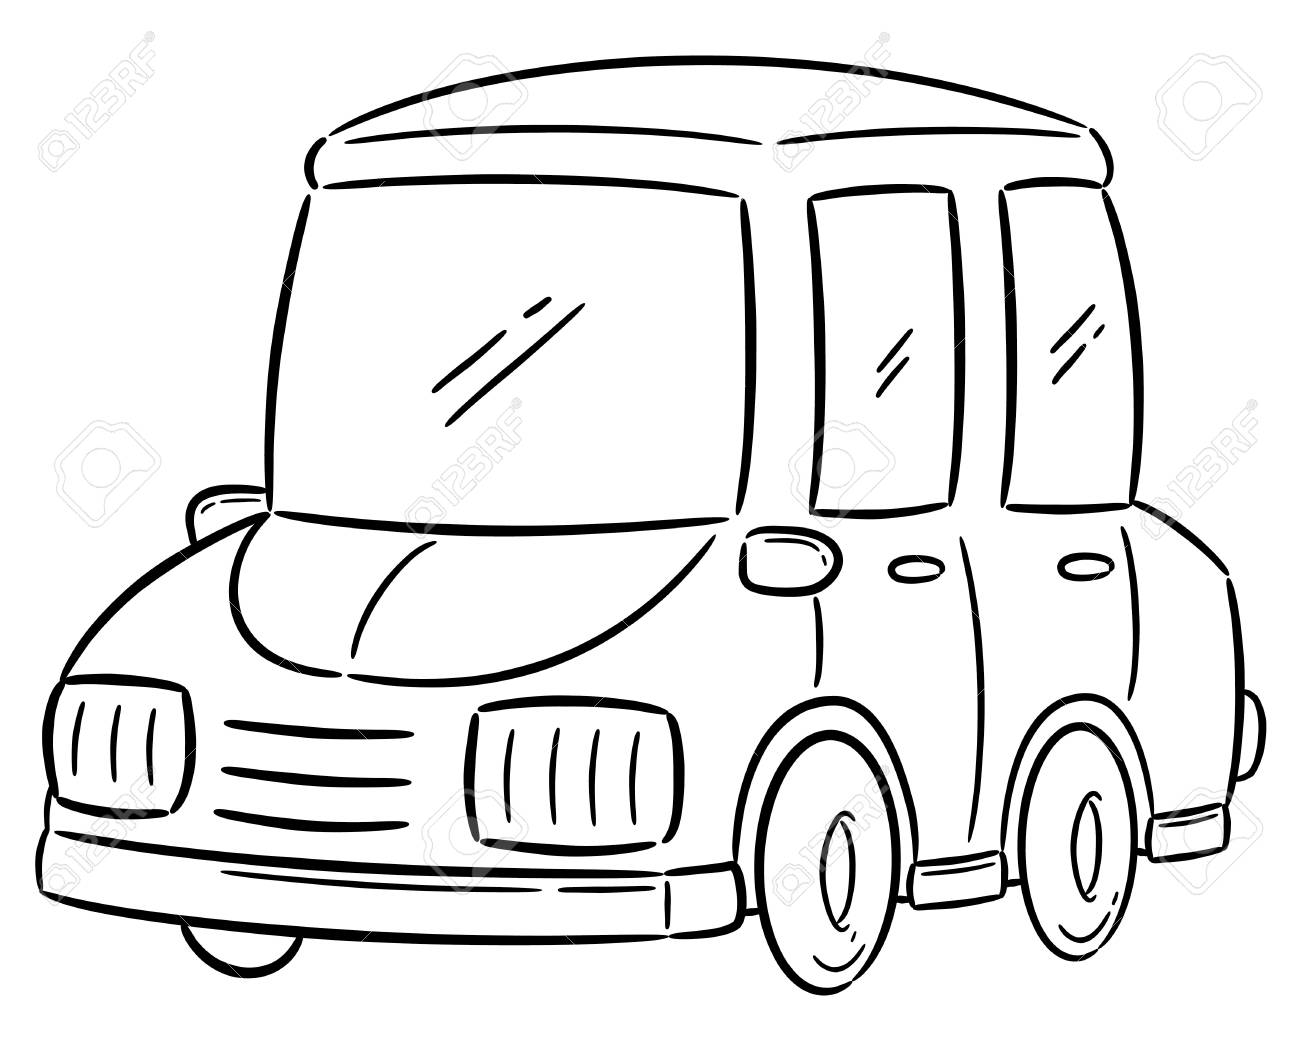 Ilustración Vectorial De Dibujos Animados De Coches Libro Para Colorear